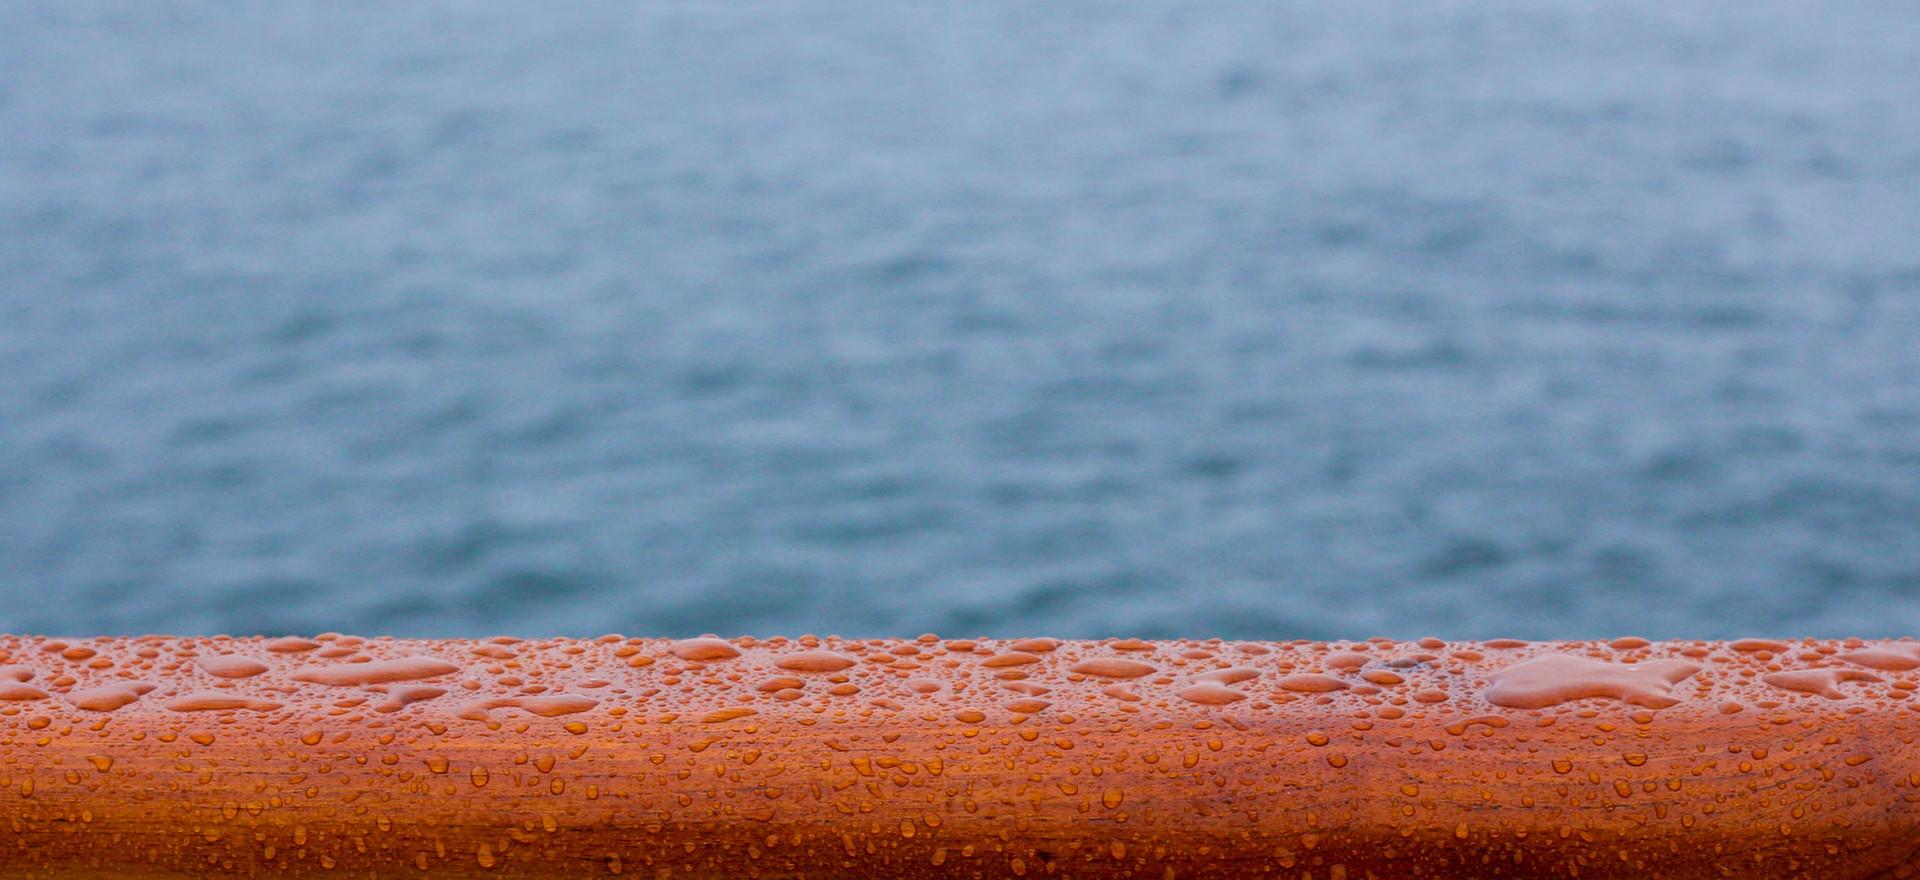 Enström: Regn